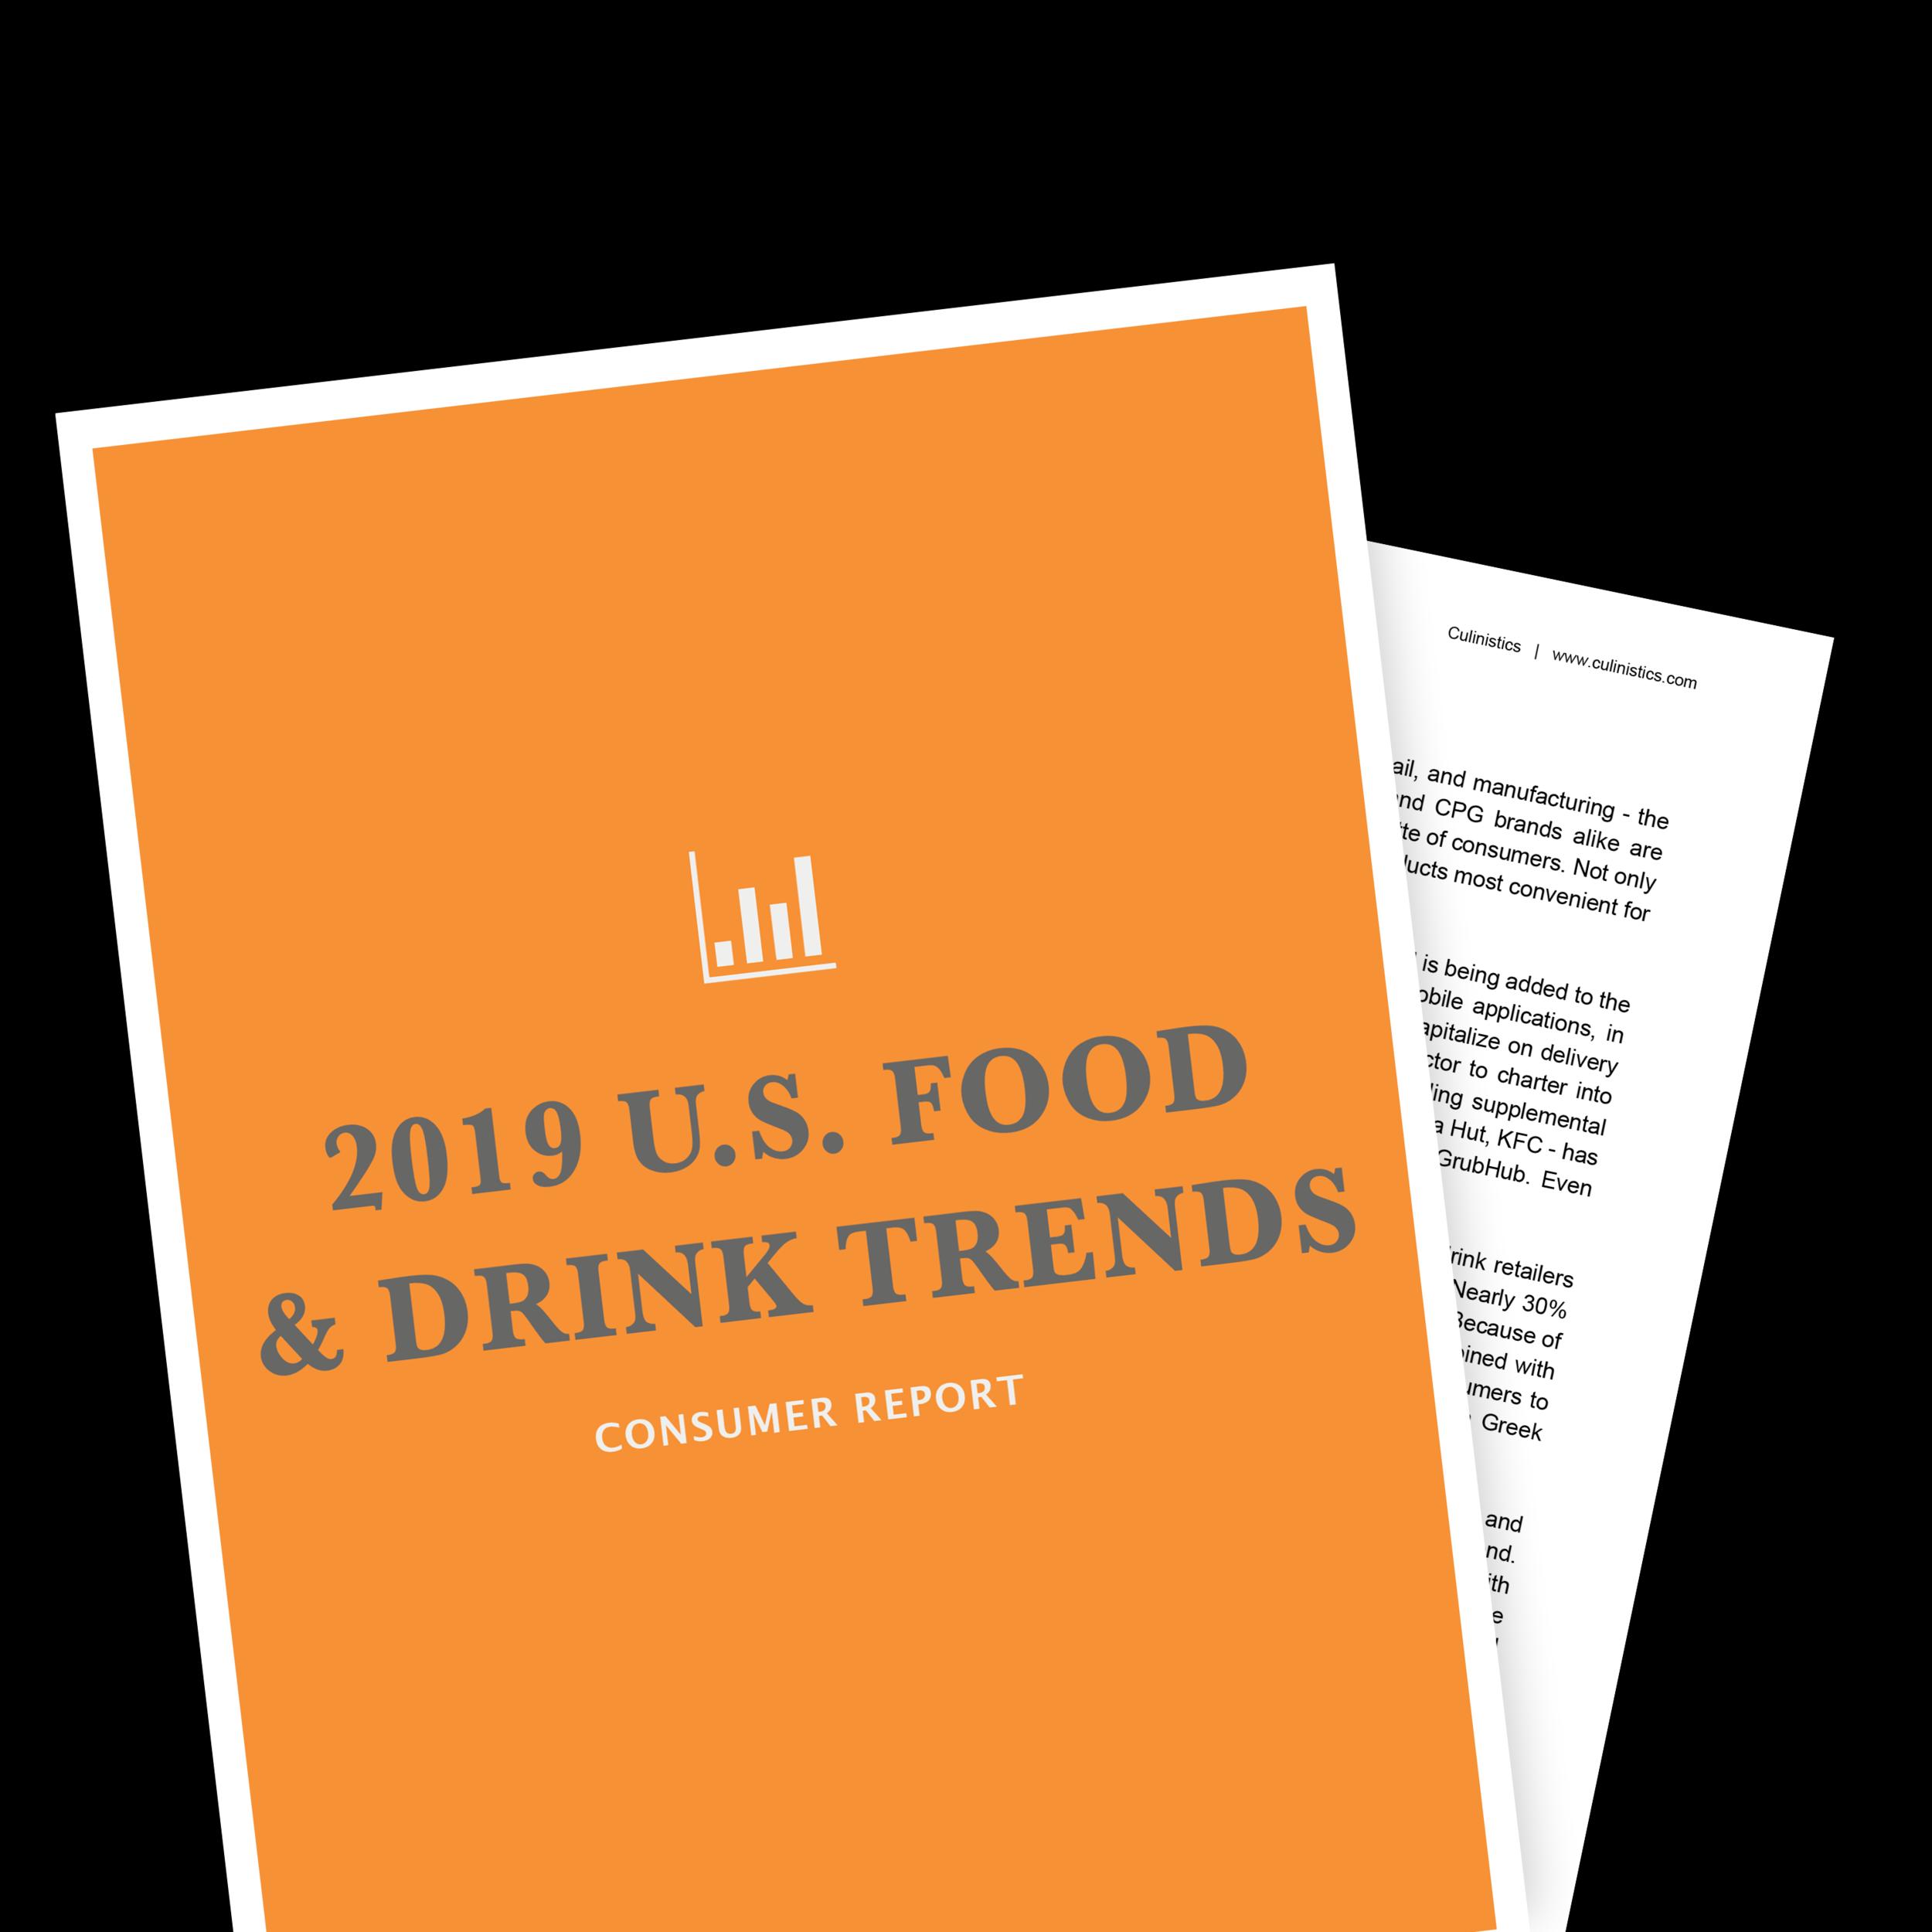 Consumer Report Sample ipad.png